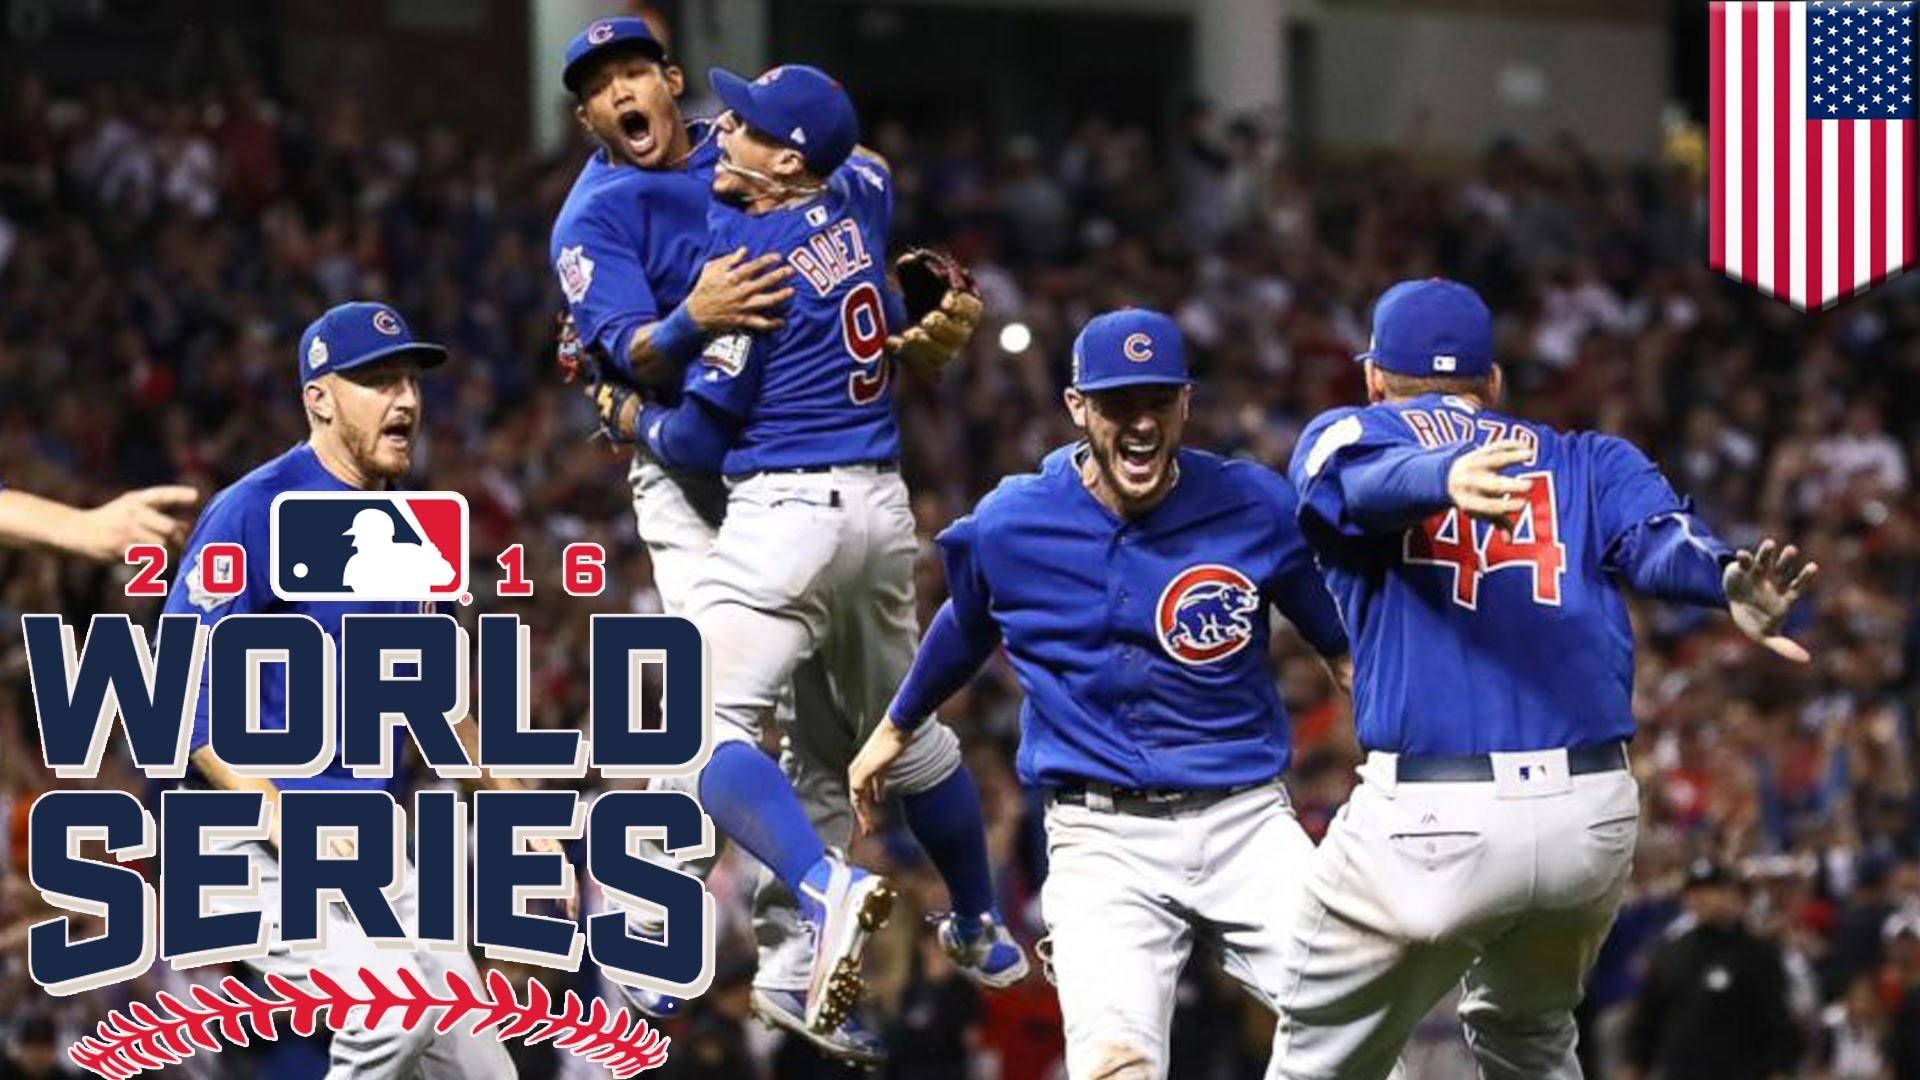 Cubs Wallpaper Screensavers 71 Images